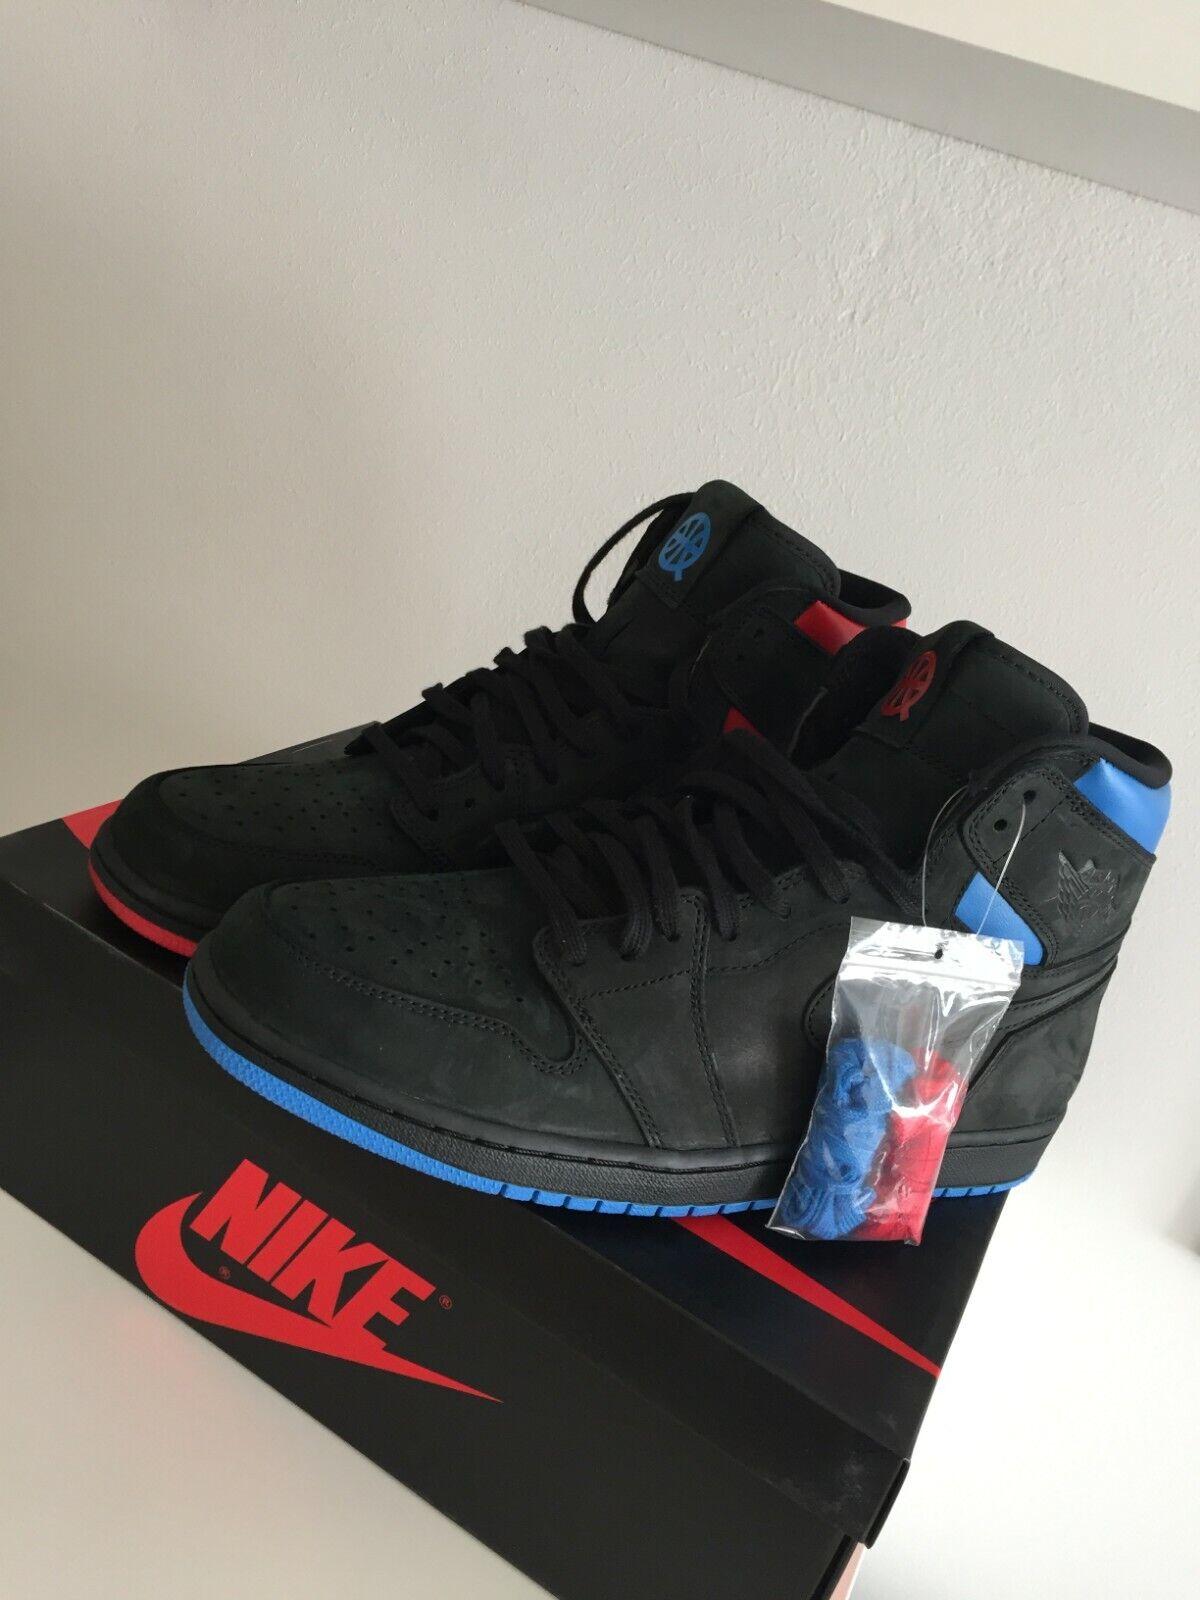 Nike Air Jordan Jordan Jordan 1 Retro High OG Quai Q54 45,5 US11,5 IV V XI Brot SOLD OUT NEU 9559ad